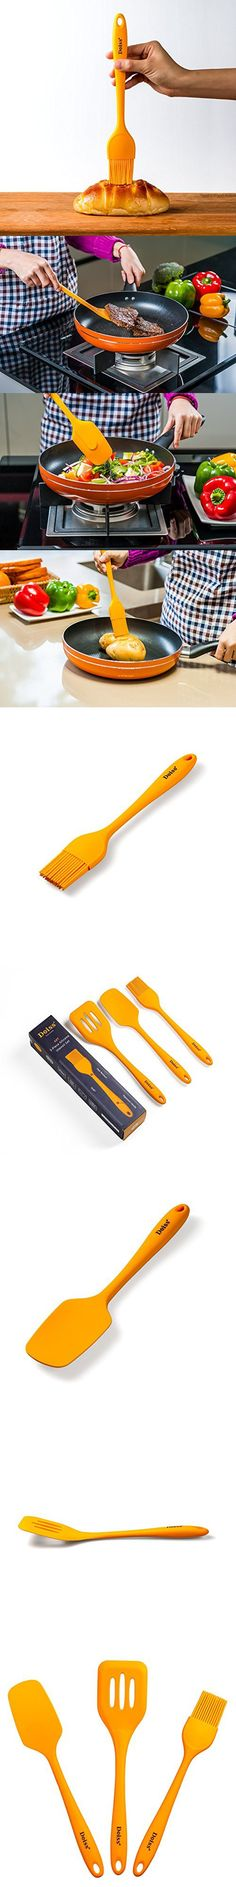 JB Prince Mini Flat Silicone Decorating Tool